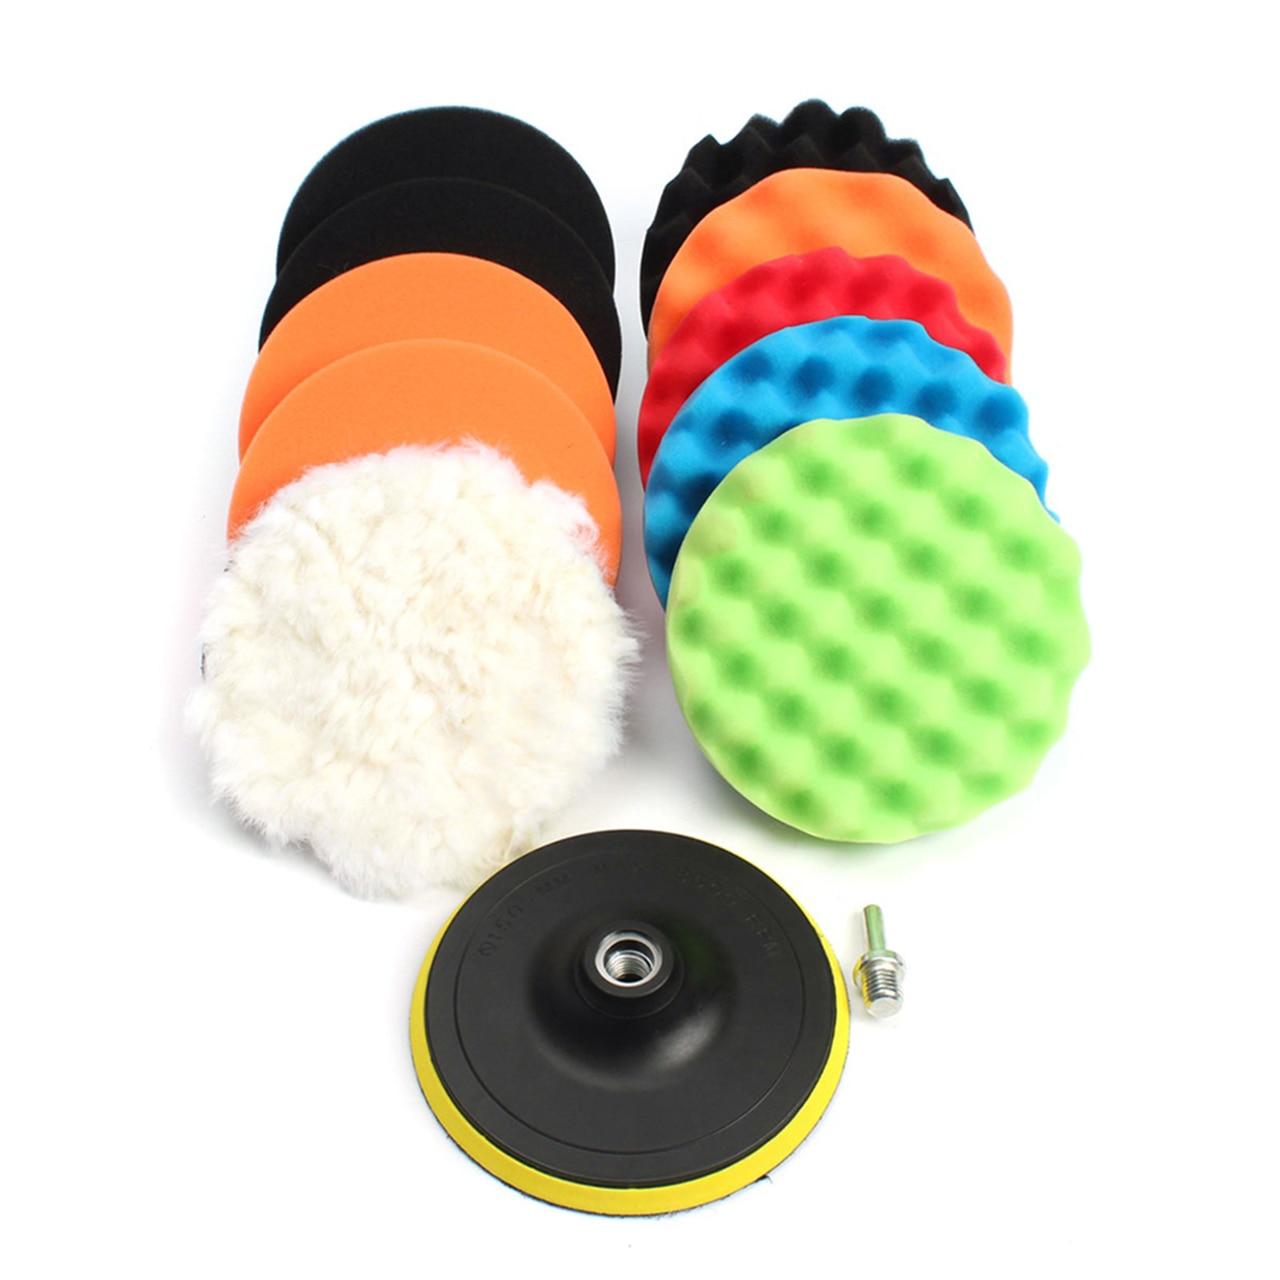 3Inch 12Pcs Buffing Sponge Polishing Waxing Pad Set Kit For Car Polisher Buffer